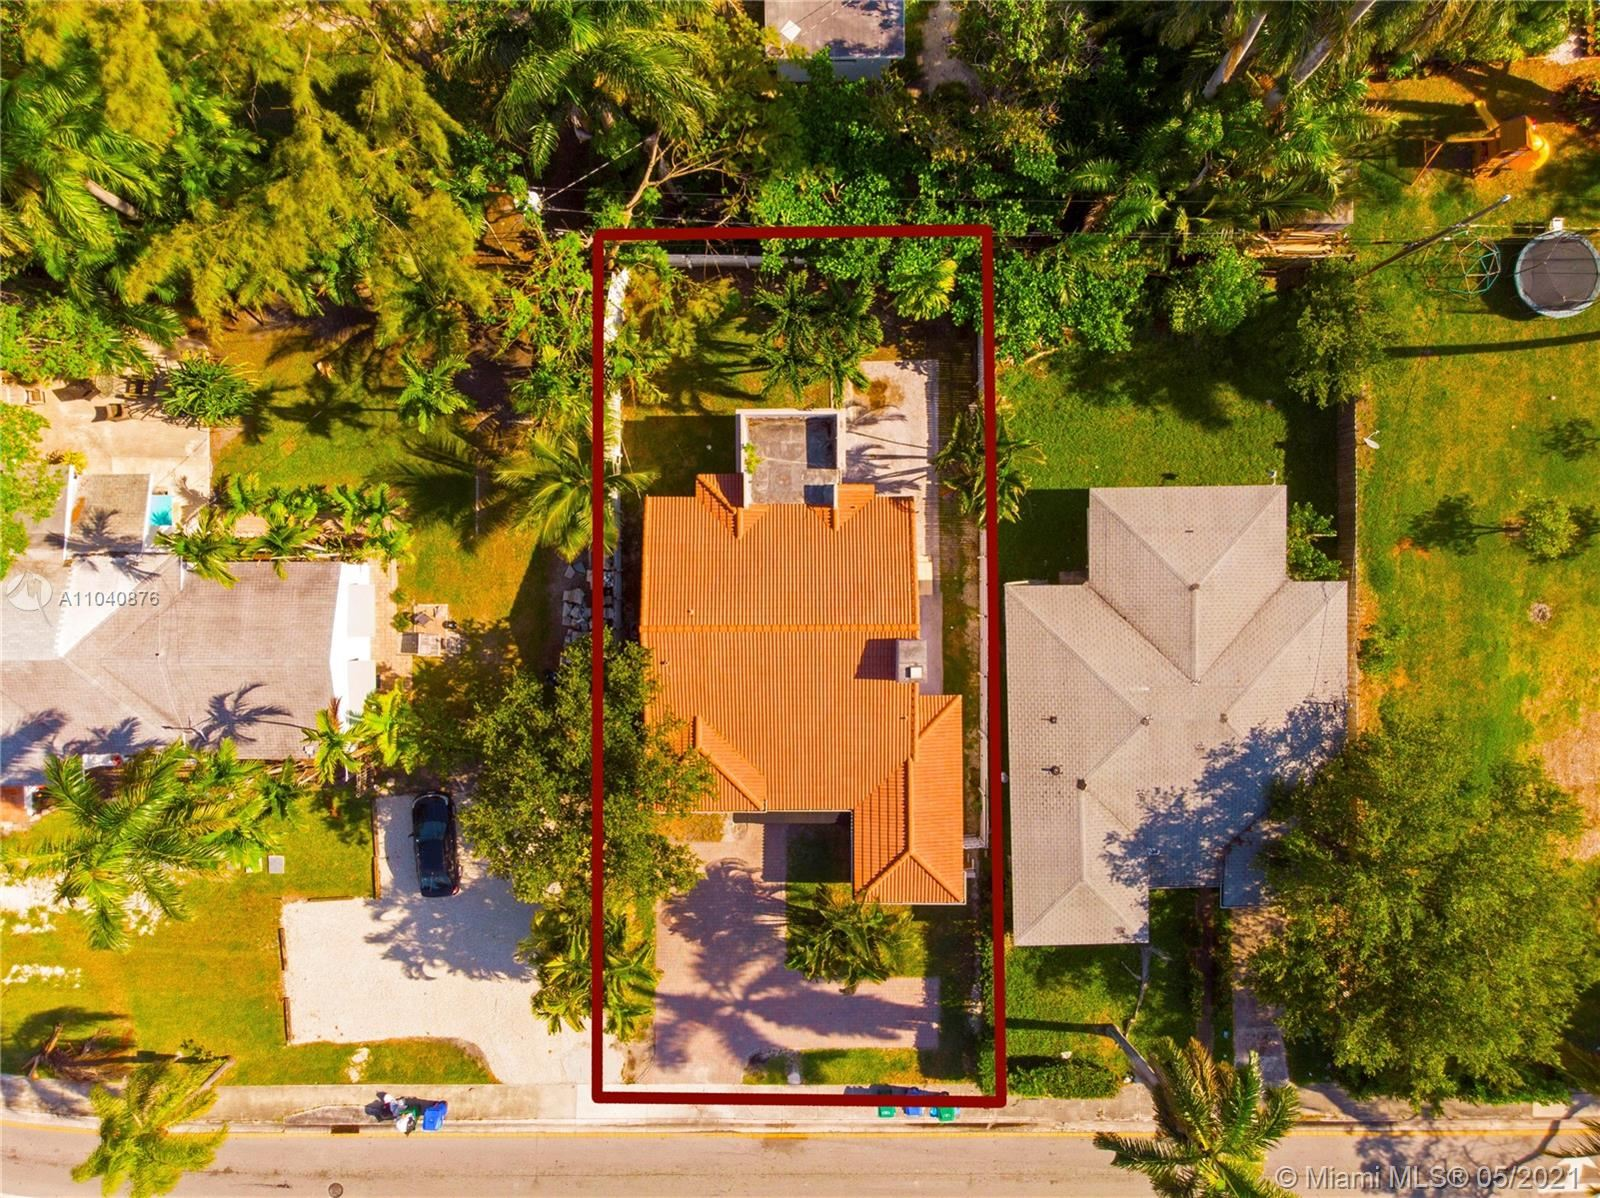 Photo of 1040 NE 82nd St, Miami, FL 33138 (MLS # A11040876)